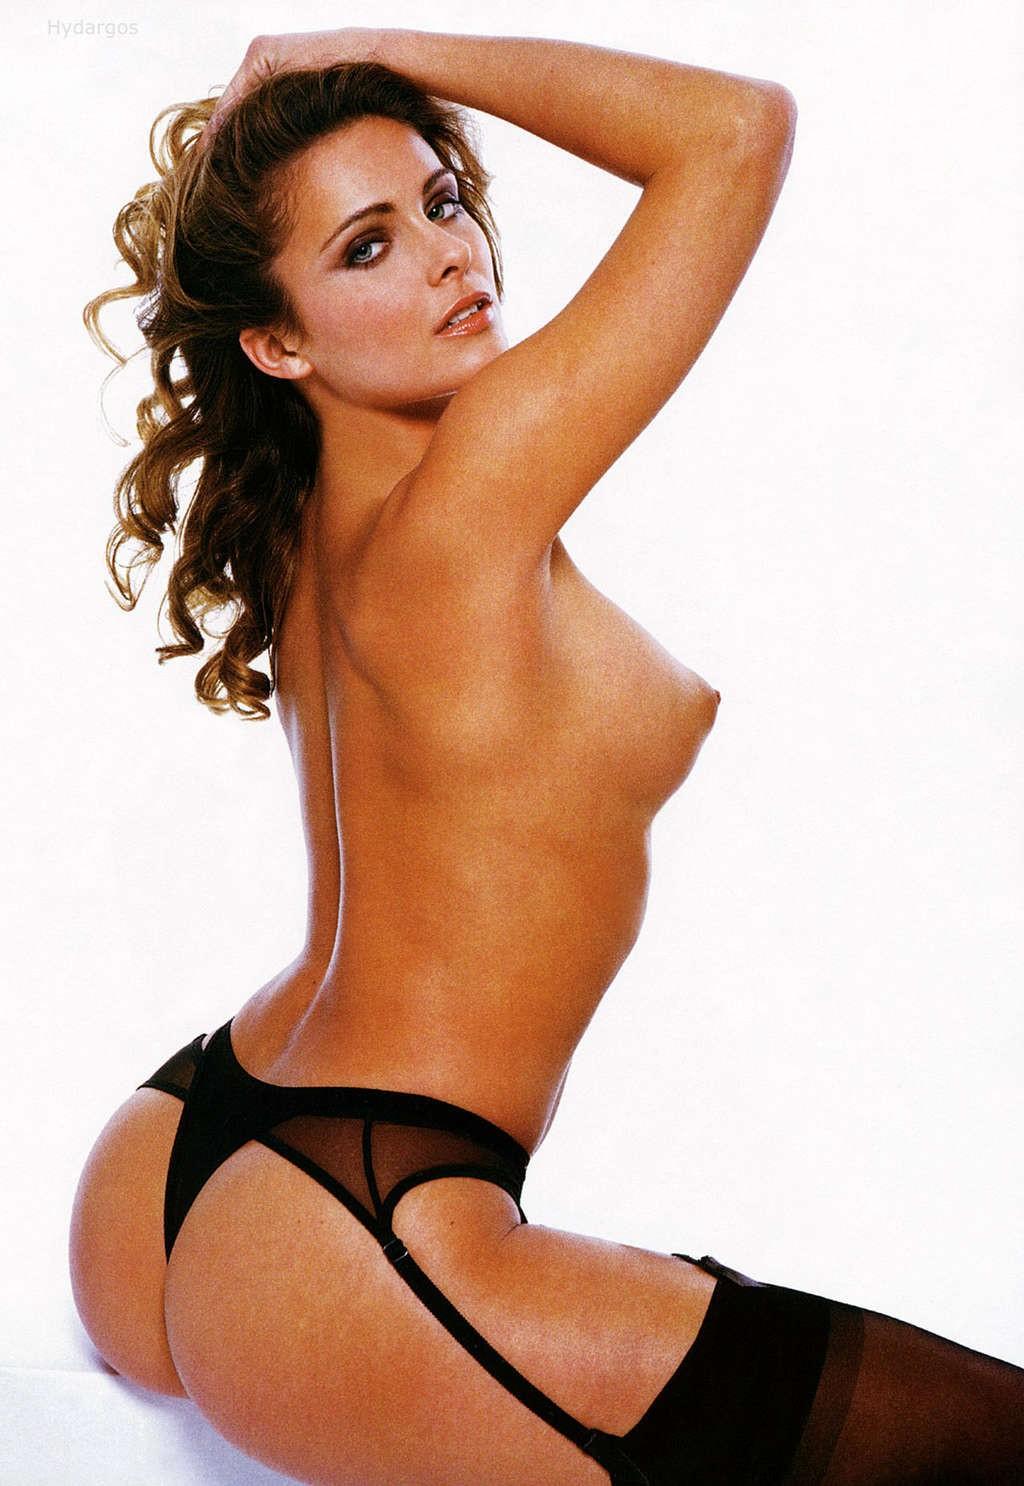 Laura ramsey sexy body